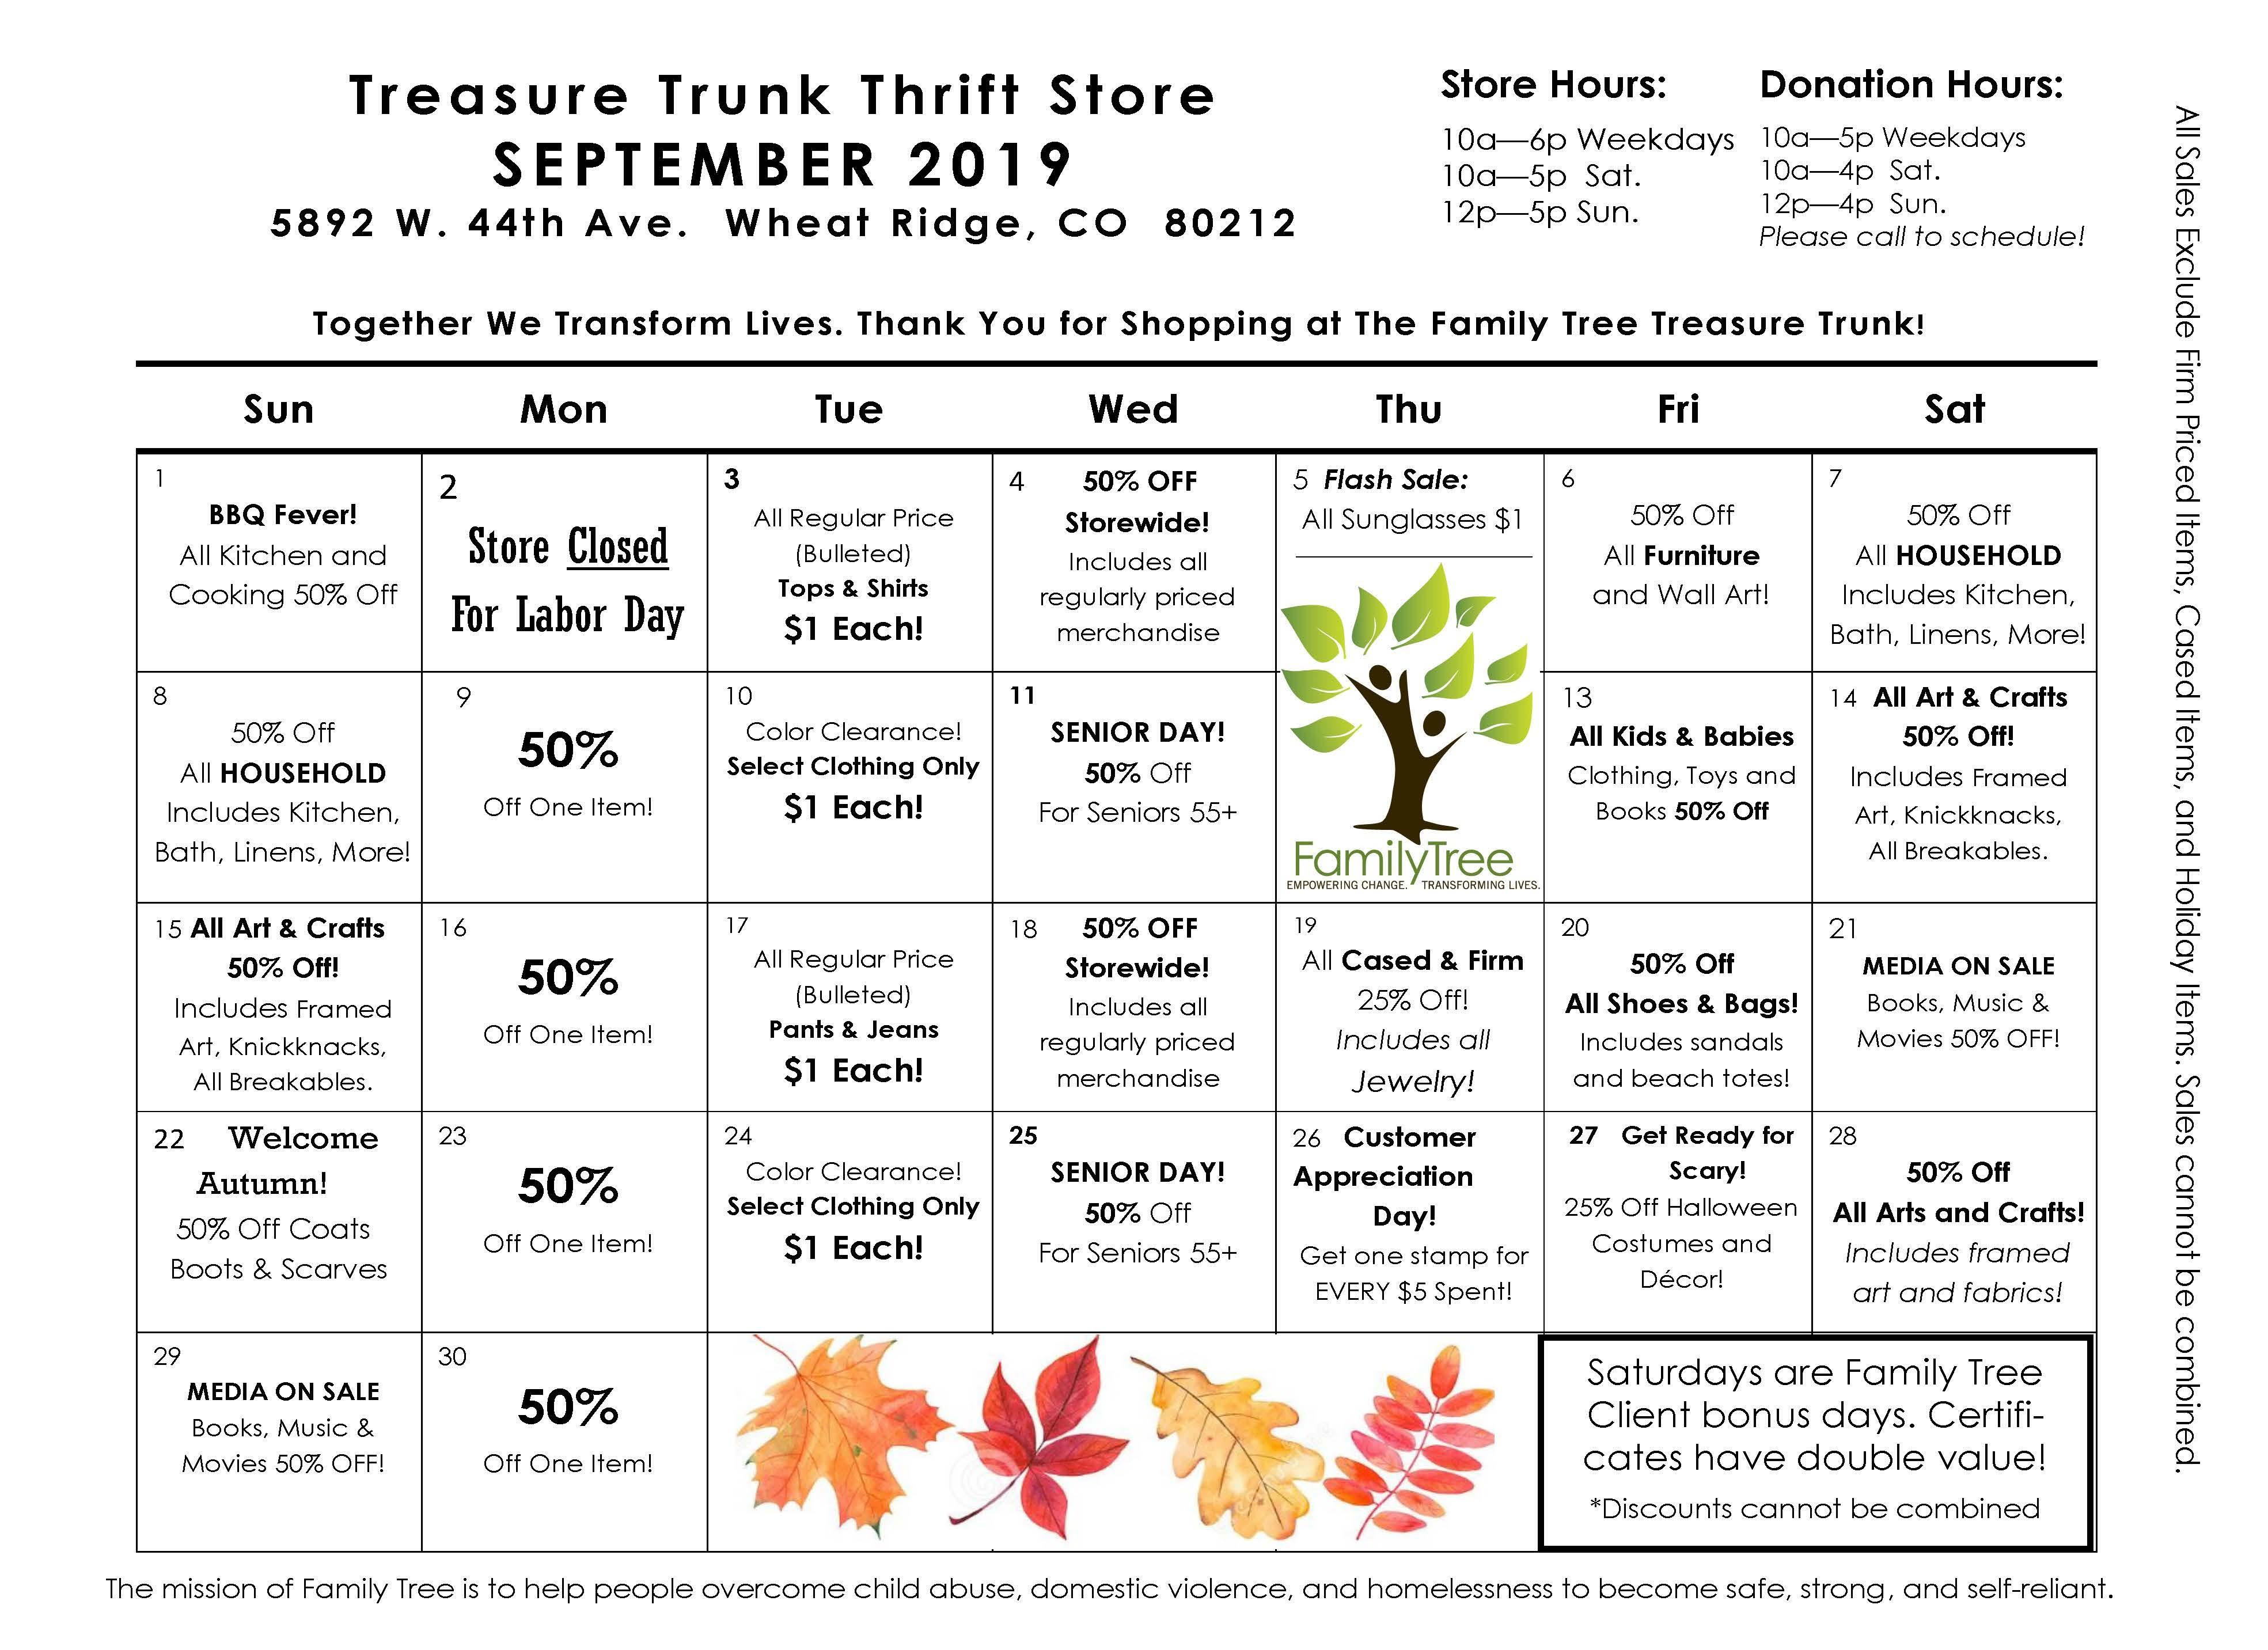 Treasure Trunk Community Thrift Store | Family Tree